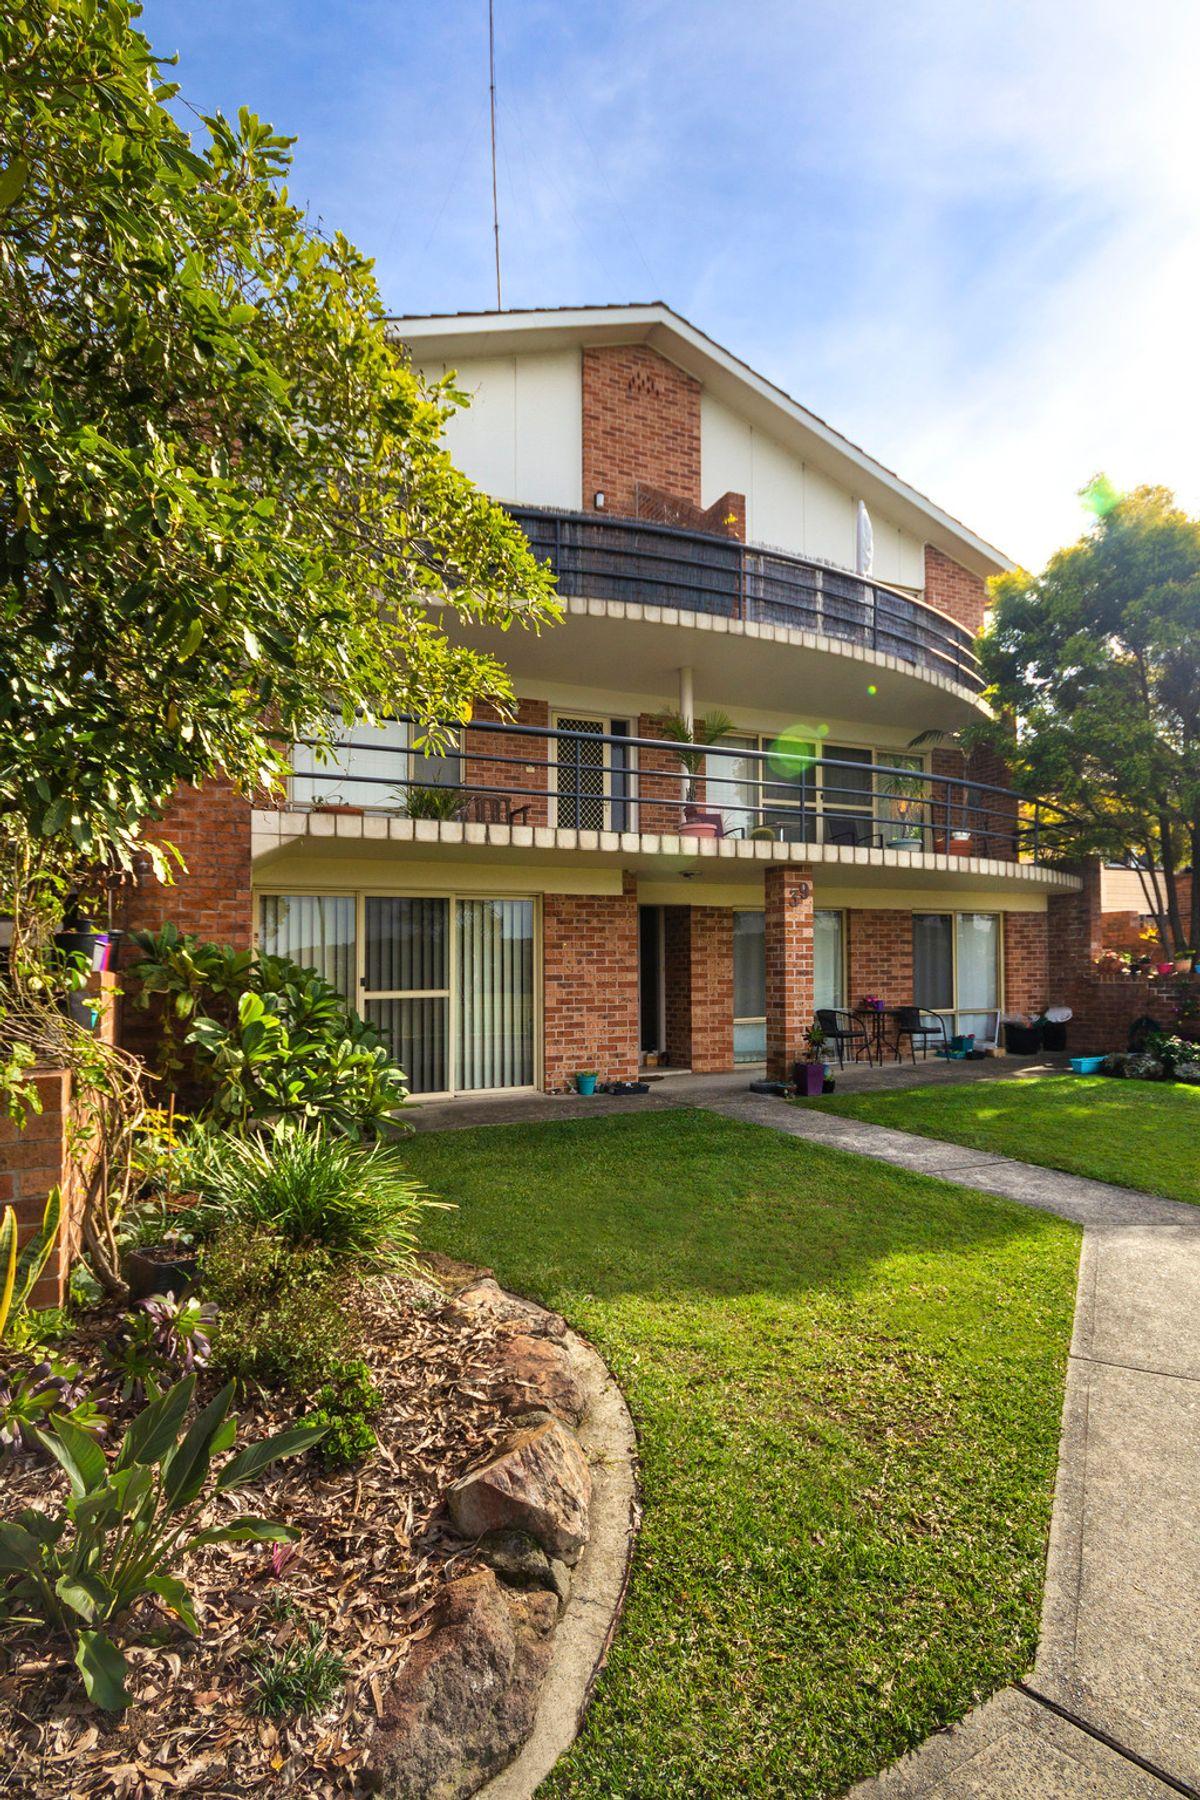 1/39 York Street, Teralba, NSW 2284